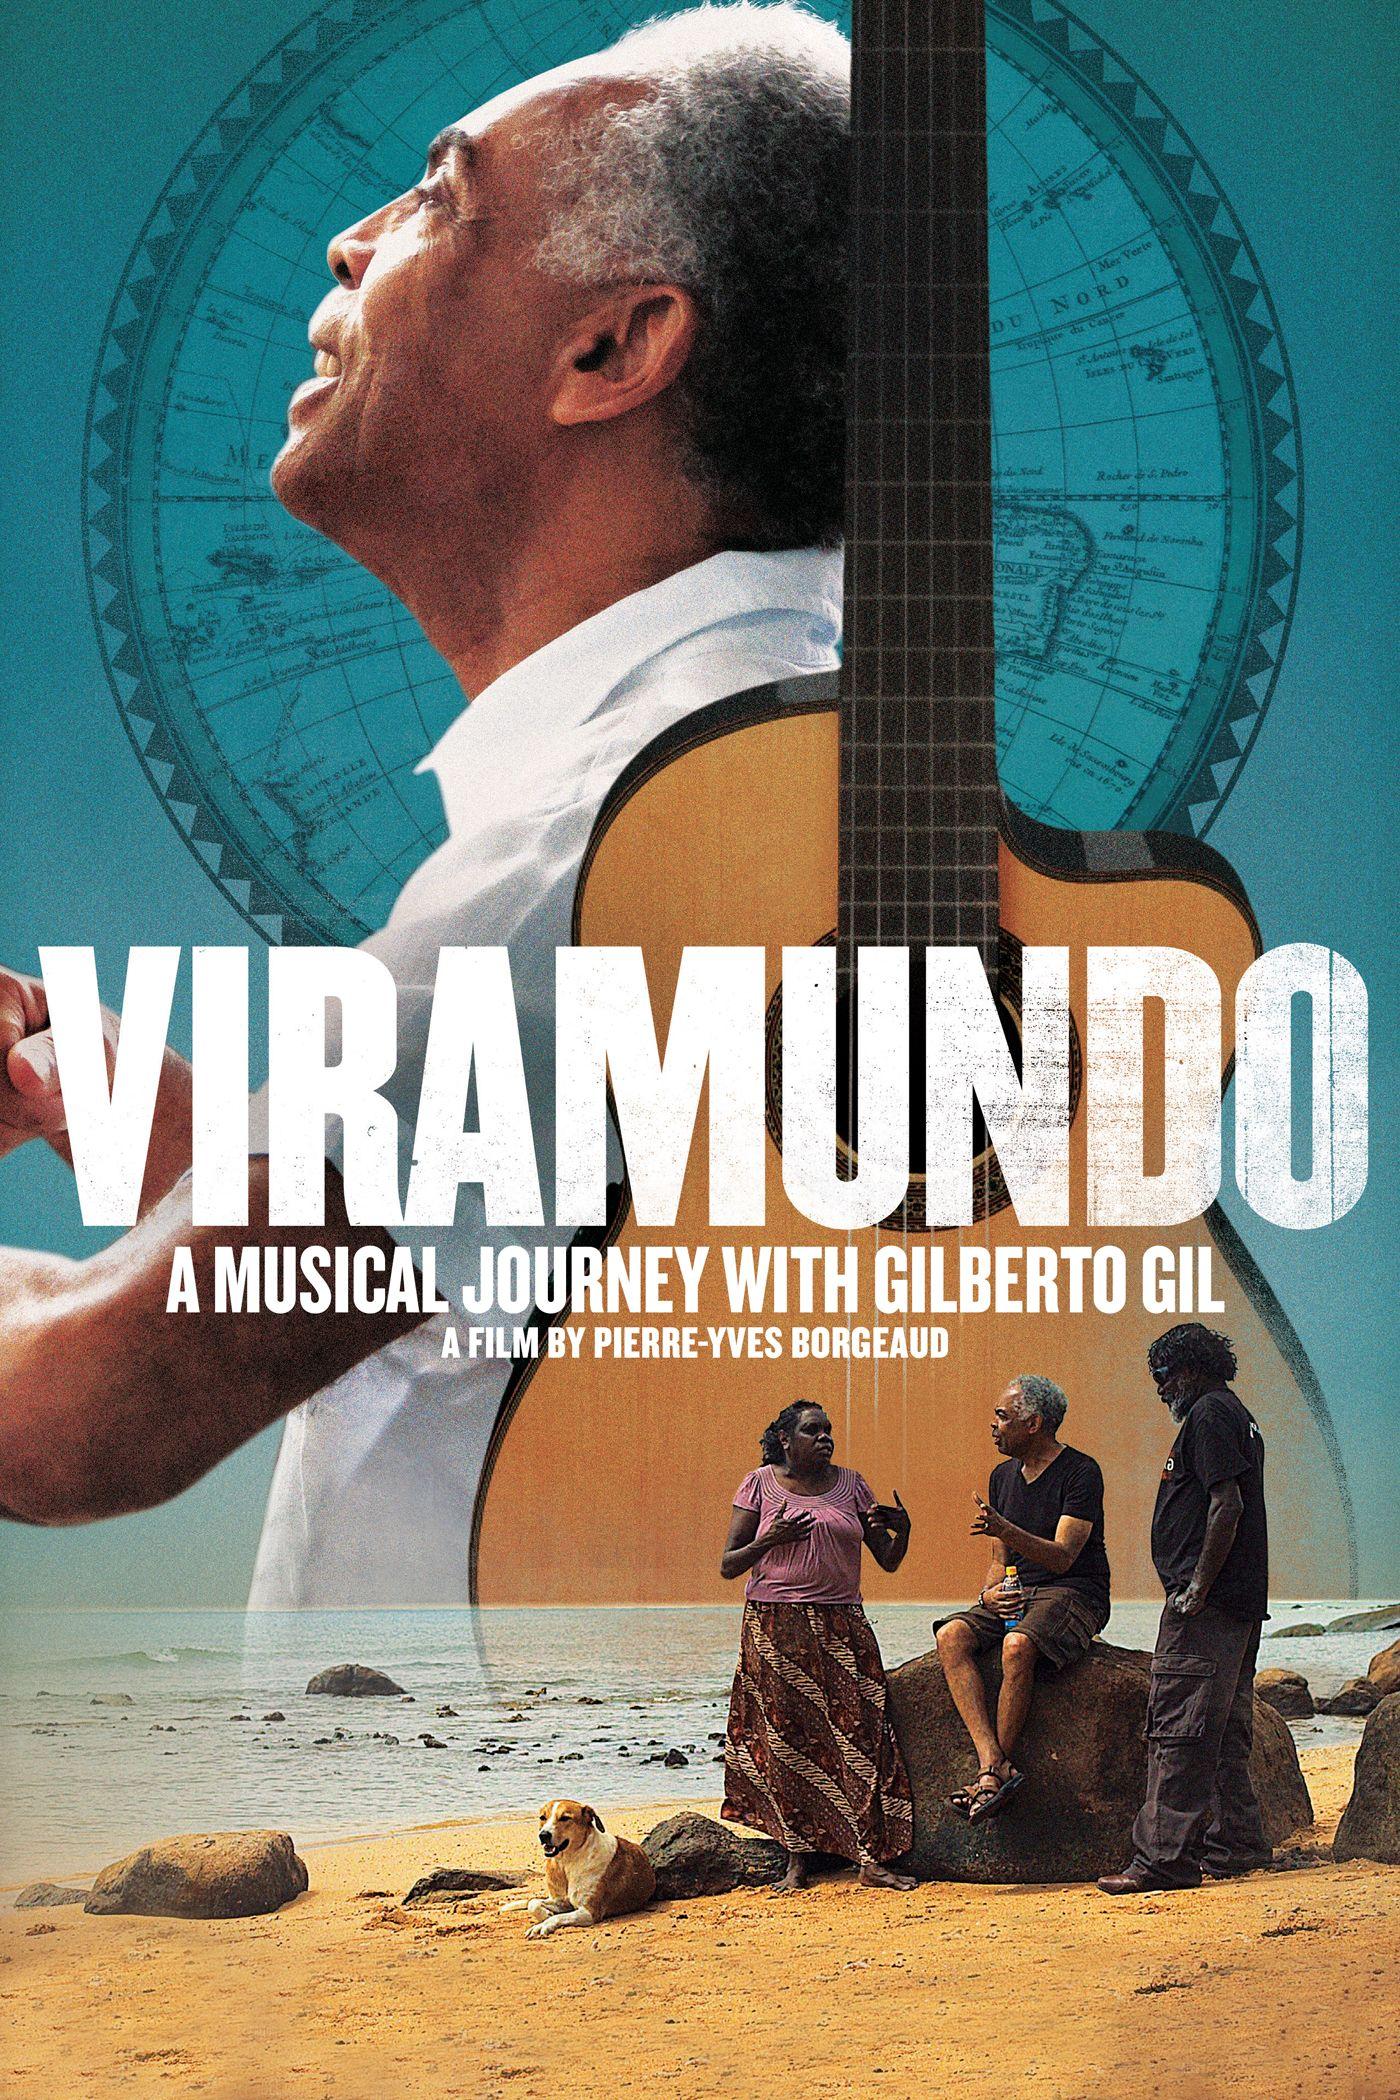 Viramundo A Musical Journey with Gilberto Gil Film